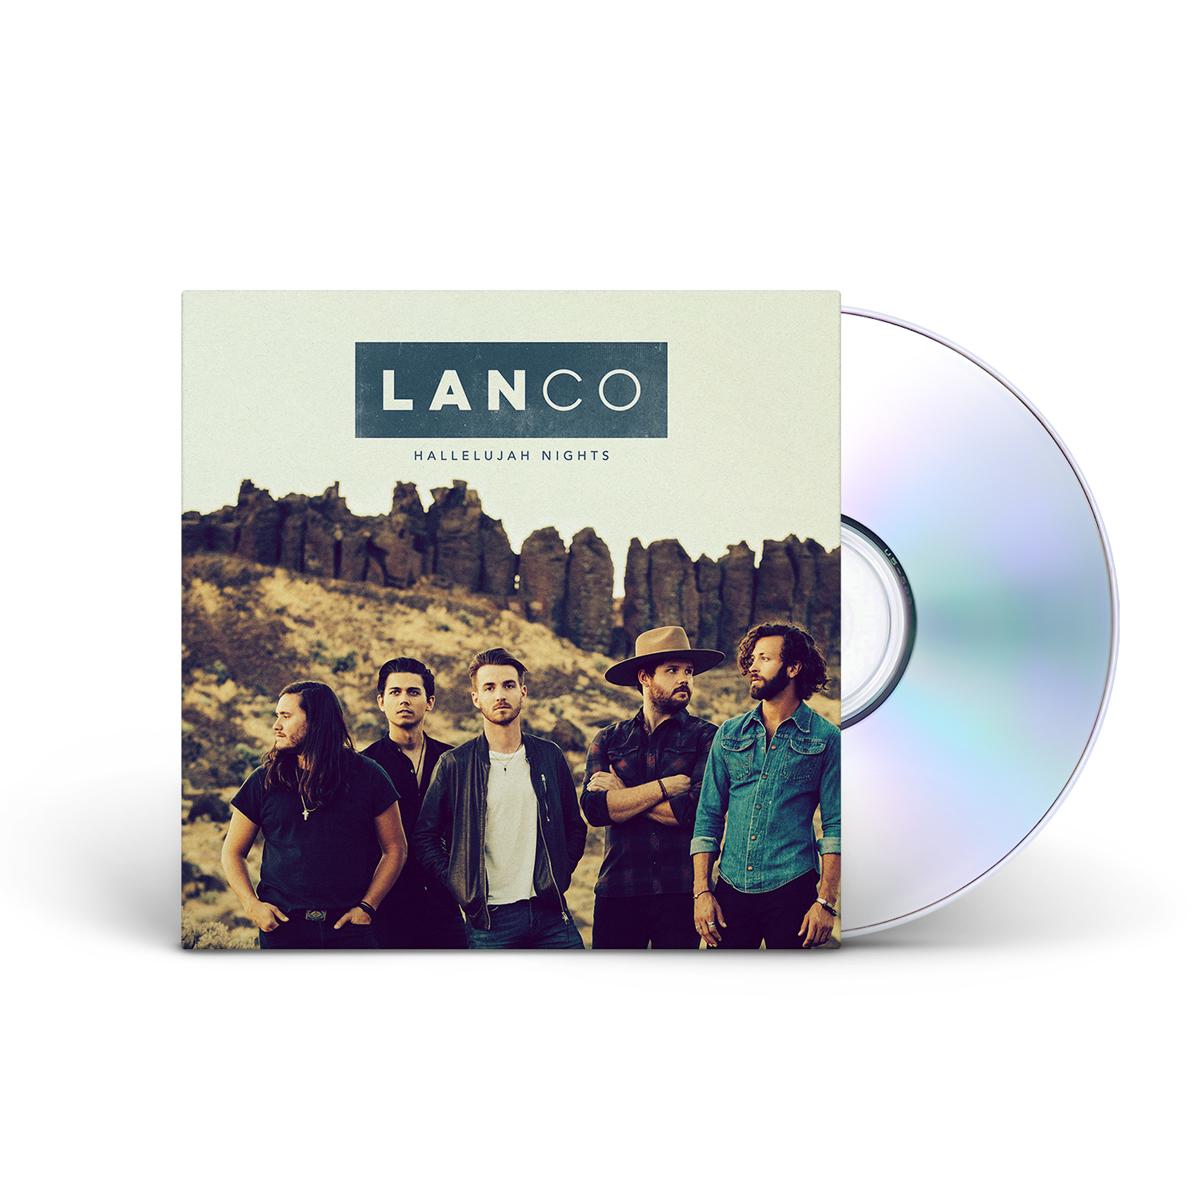 LANCO Hallelujah Nights CD